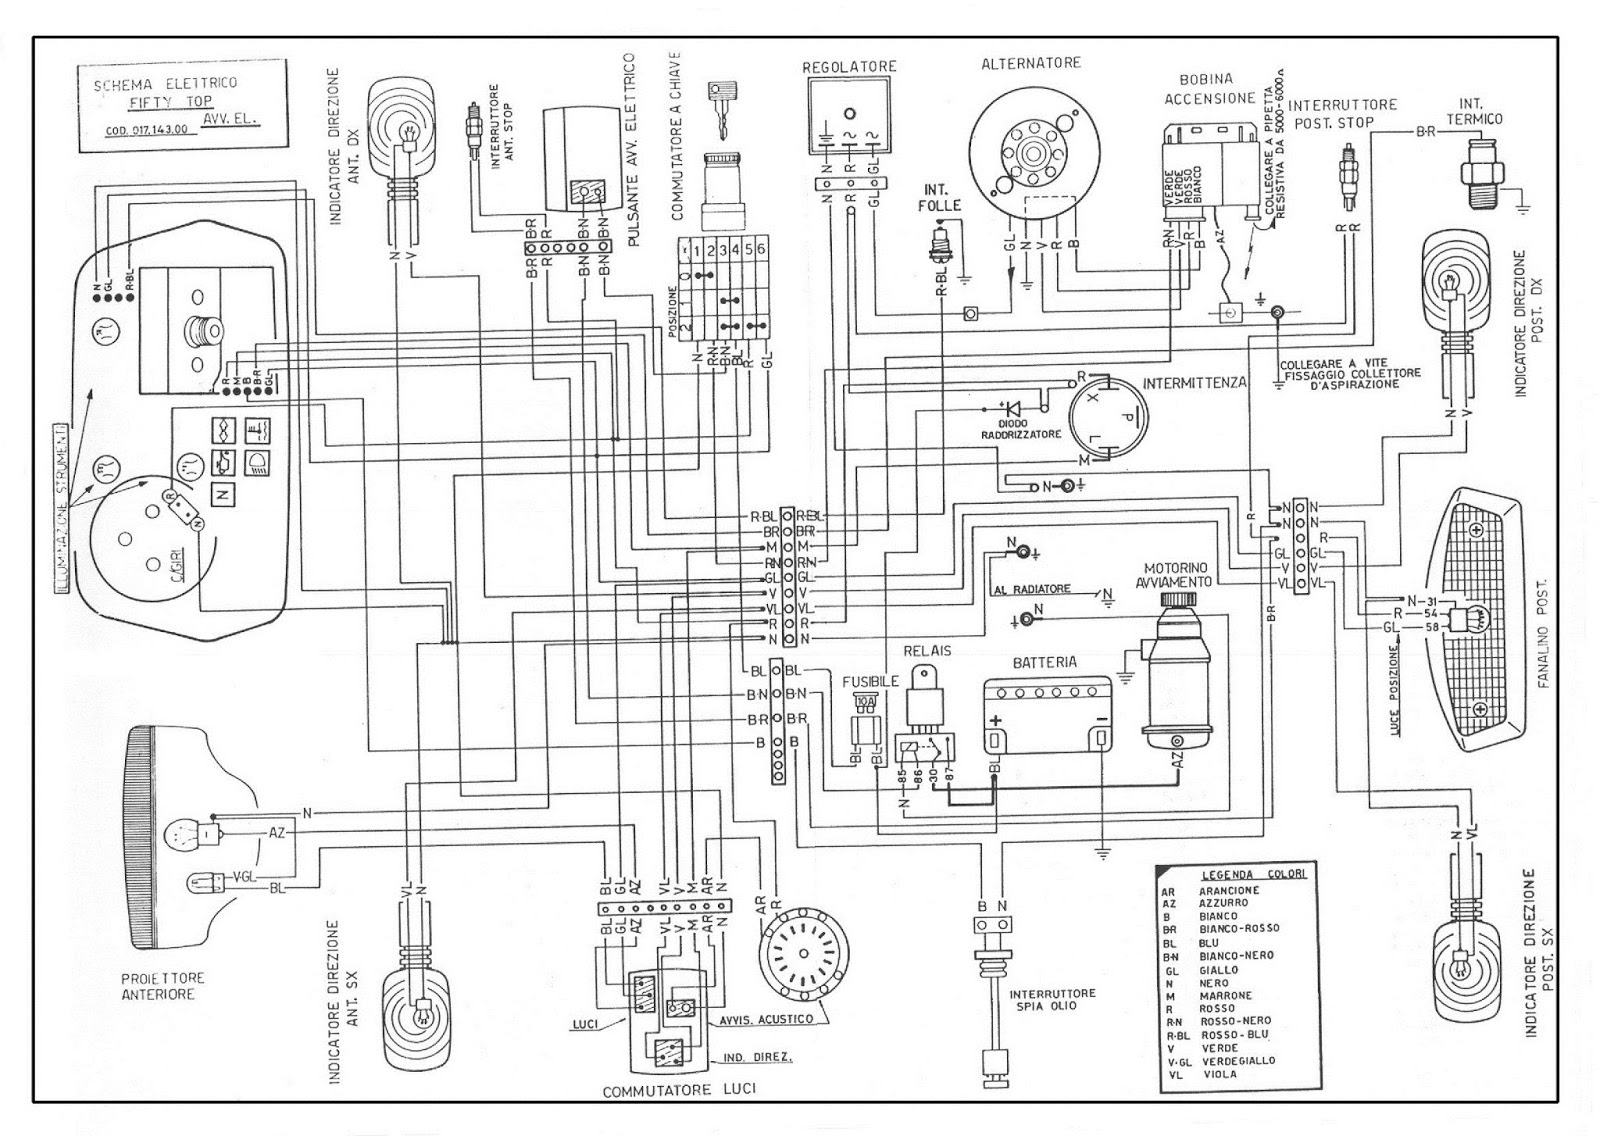 Schema Elettrico Yamaha Top : Malaguti fifty schema elettrico top